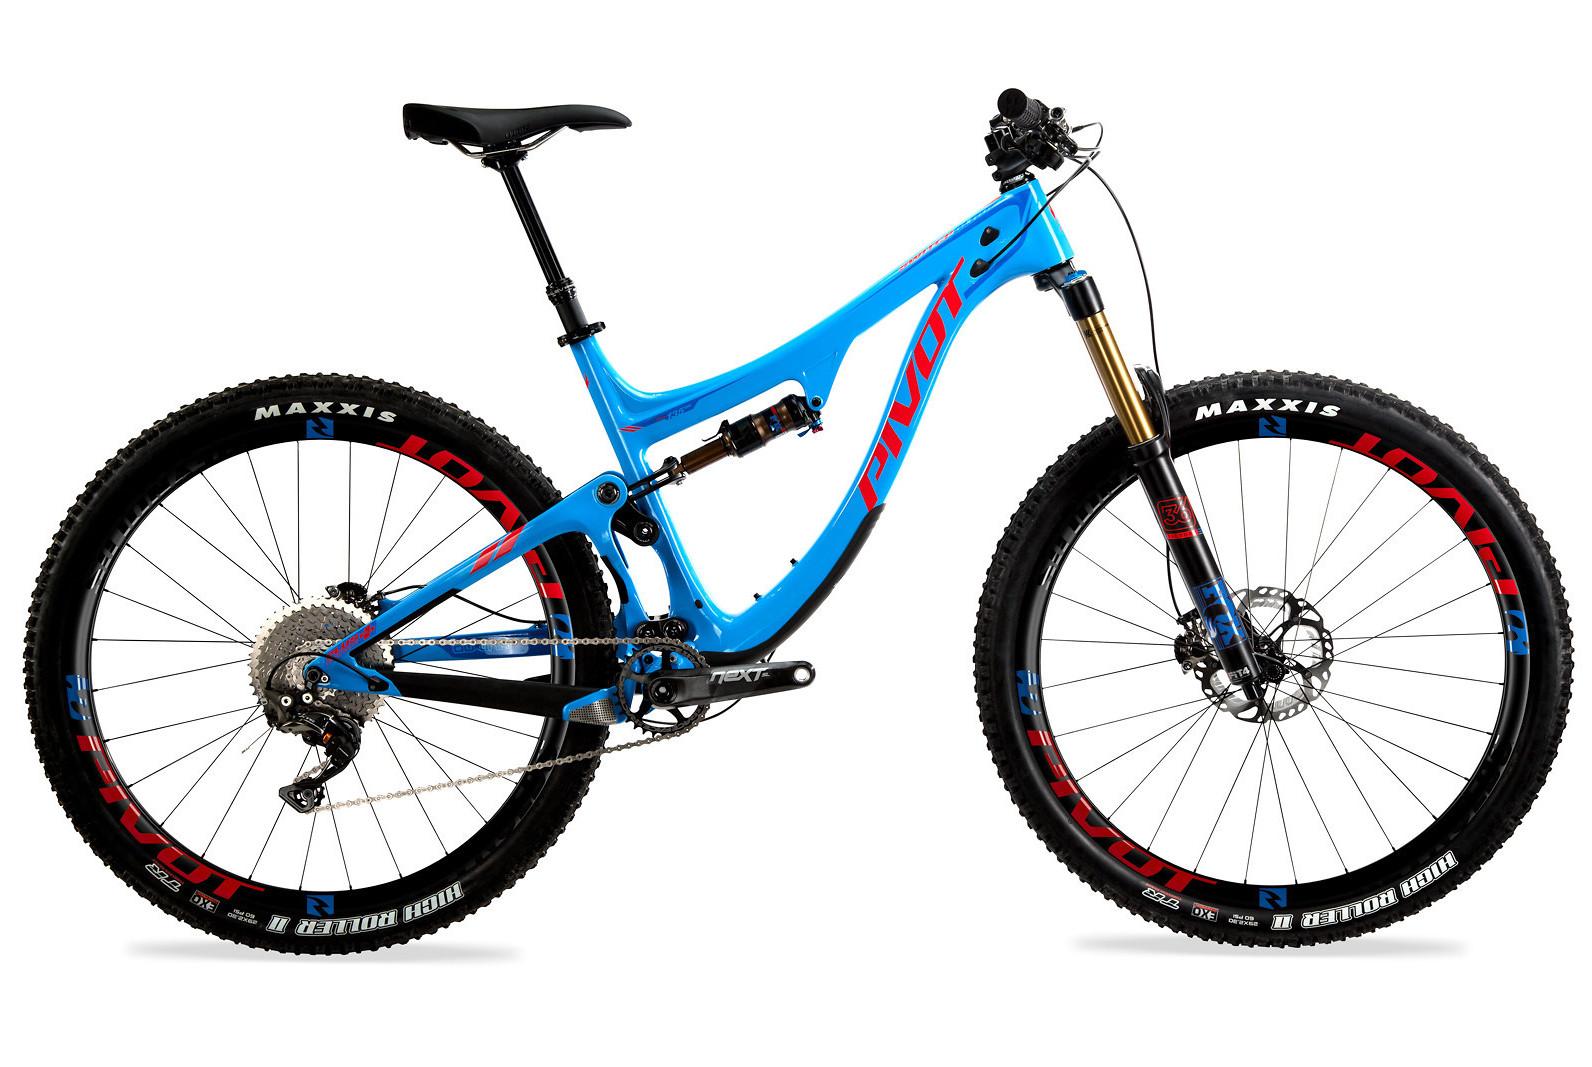 s1600_switchblade_29_carbon_blue_XTR